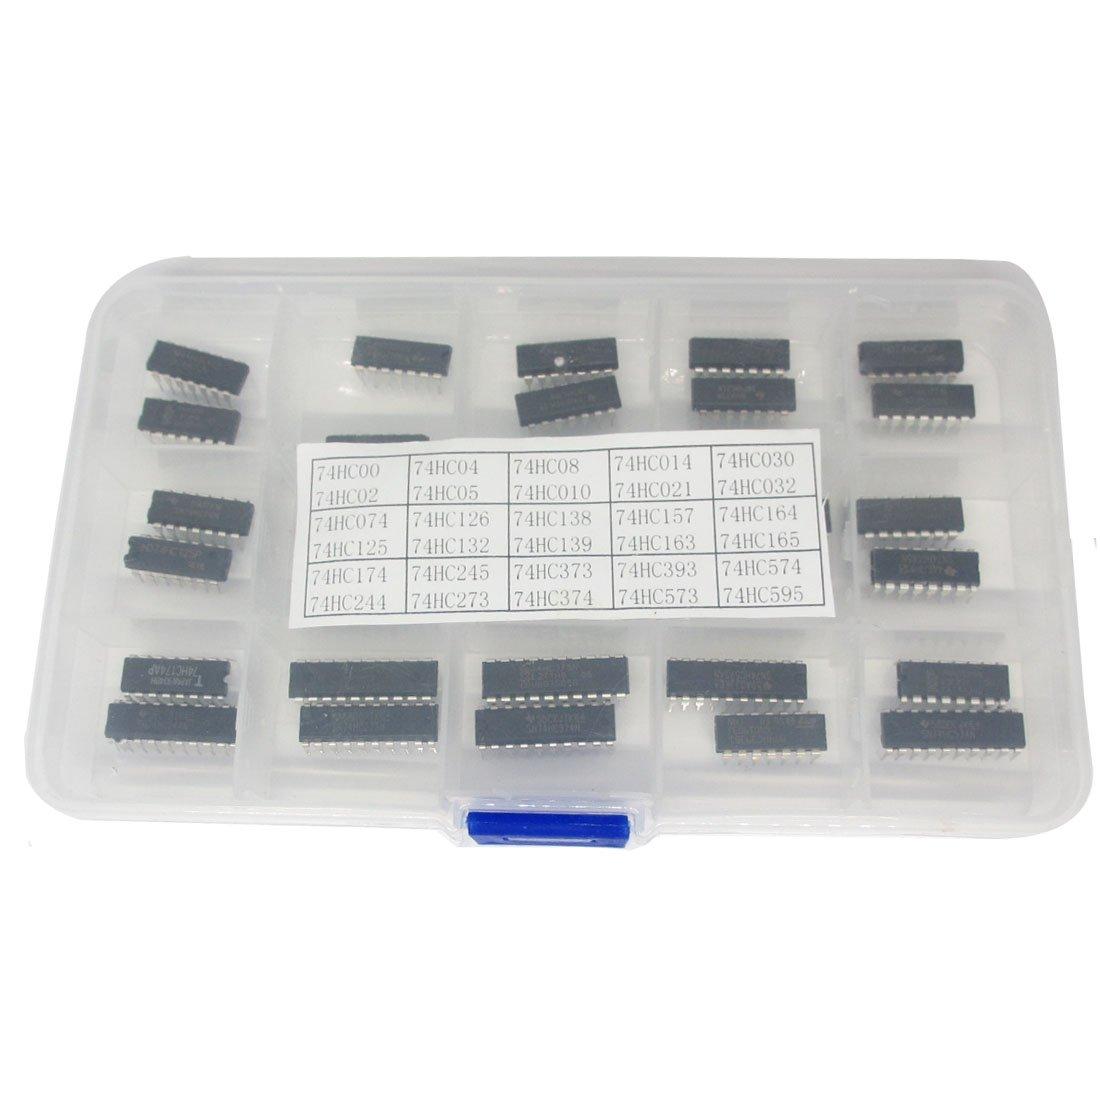 30 Types 74HC Series Logic IC Assortment Kit, High-Speed Si-Gate CMOS IC In Assortment Box